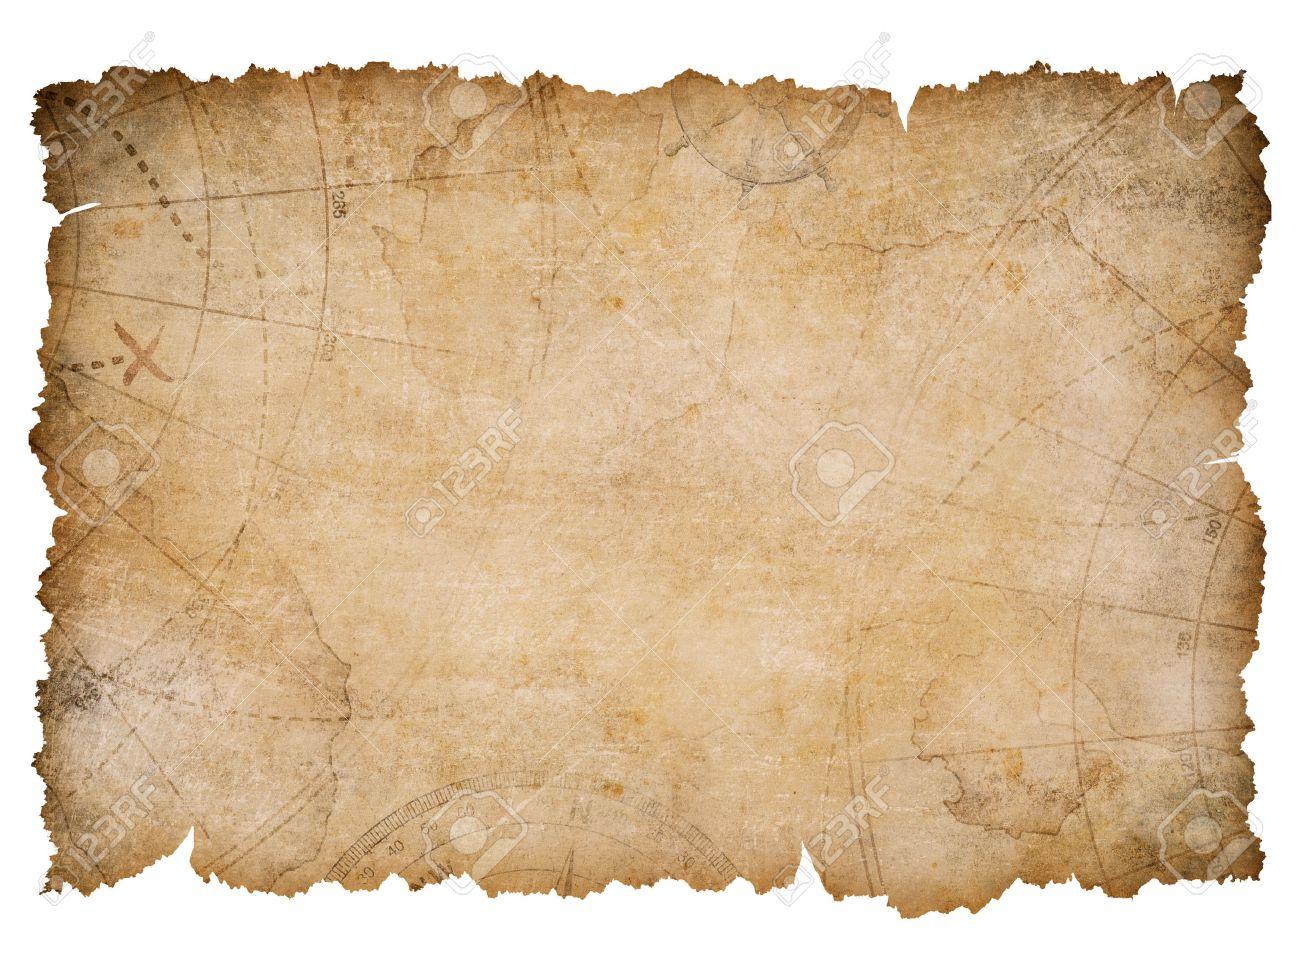 Parchment Stock Photos Royalty Free Parchment Images And Pictures - Us parchment map